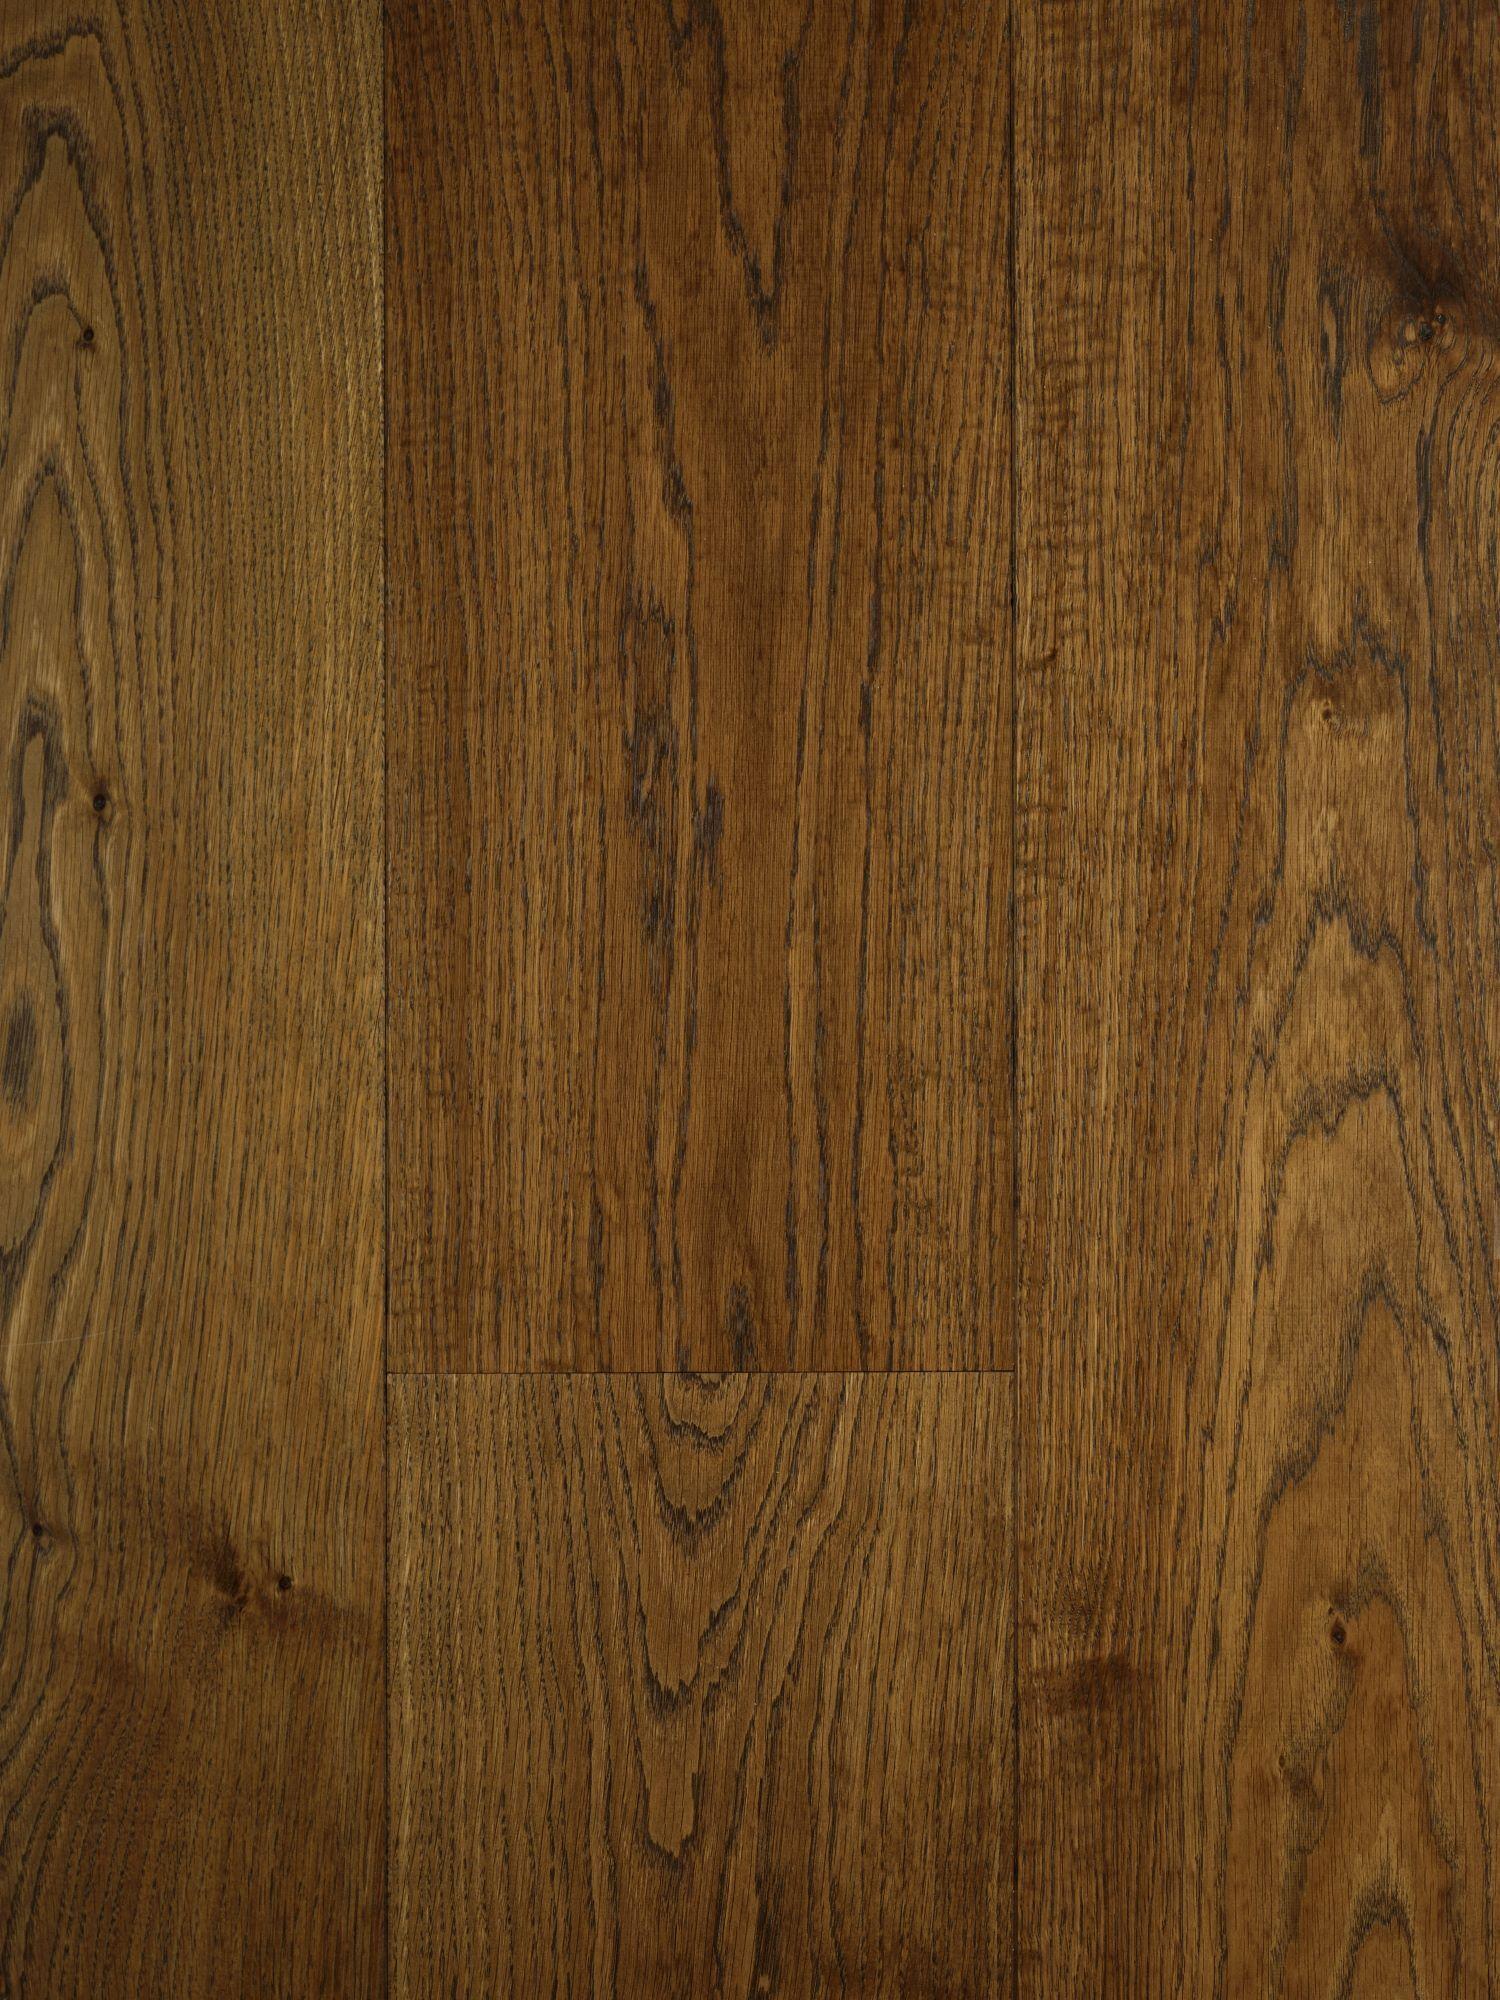 Rich brown oak flooring landmark derrymore